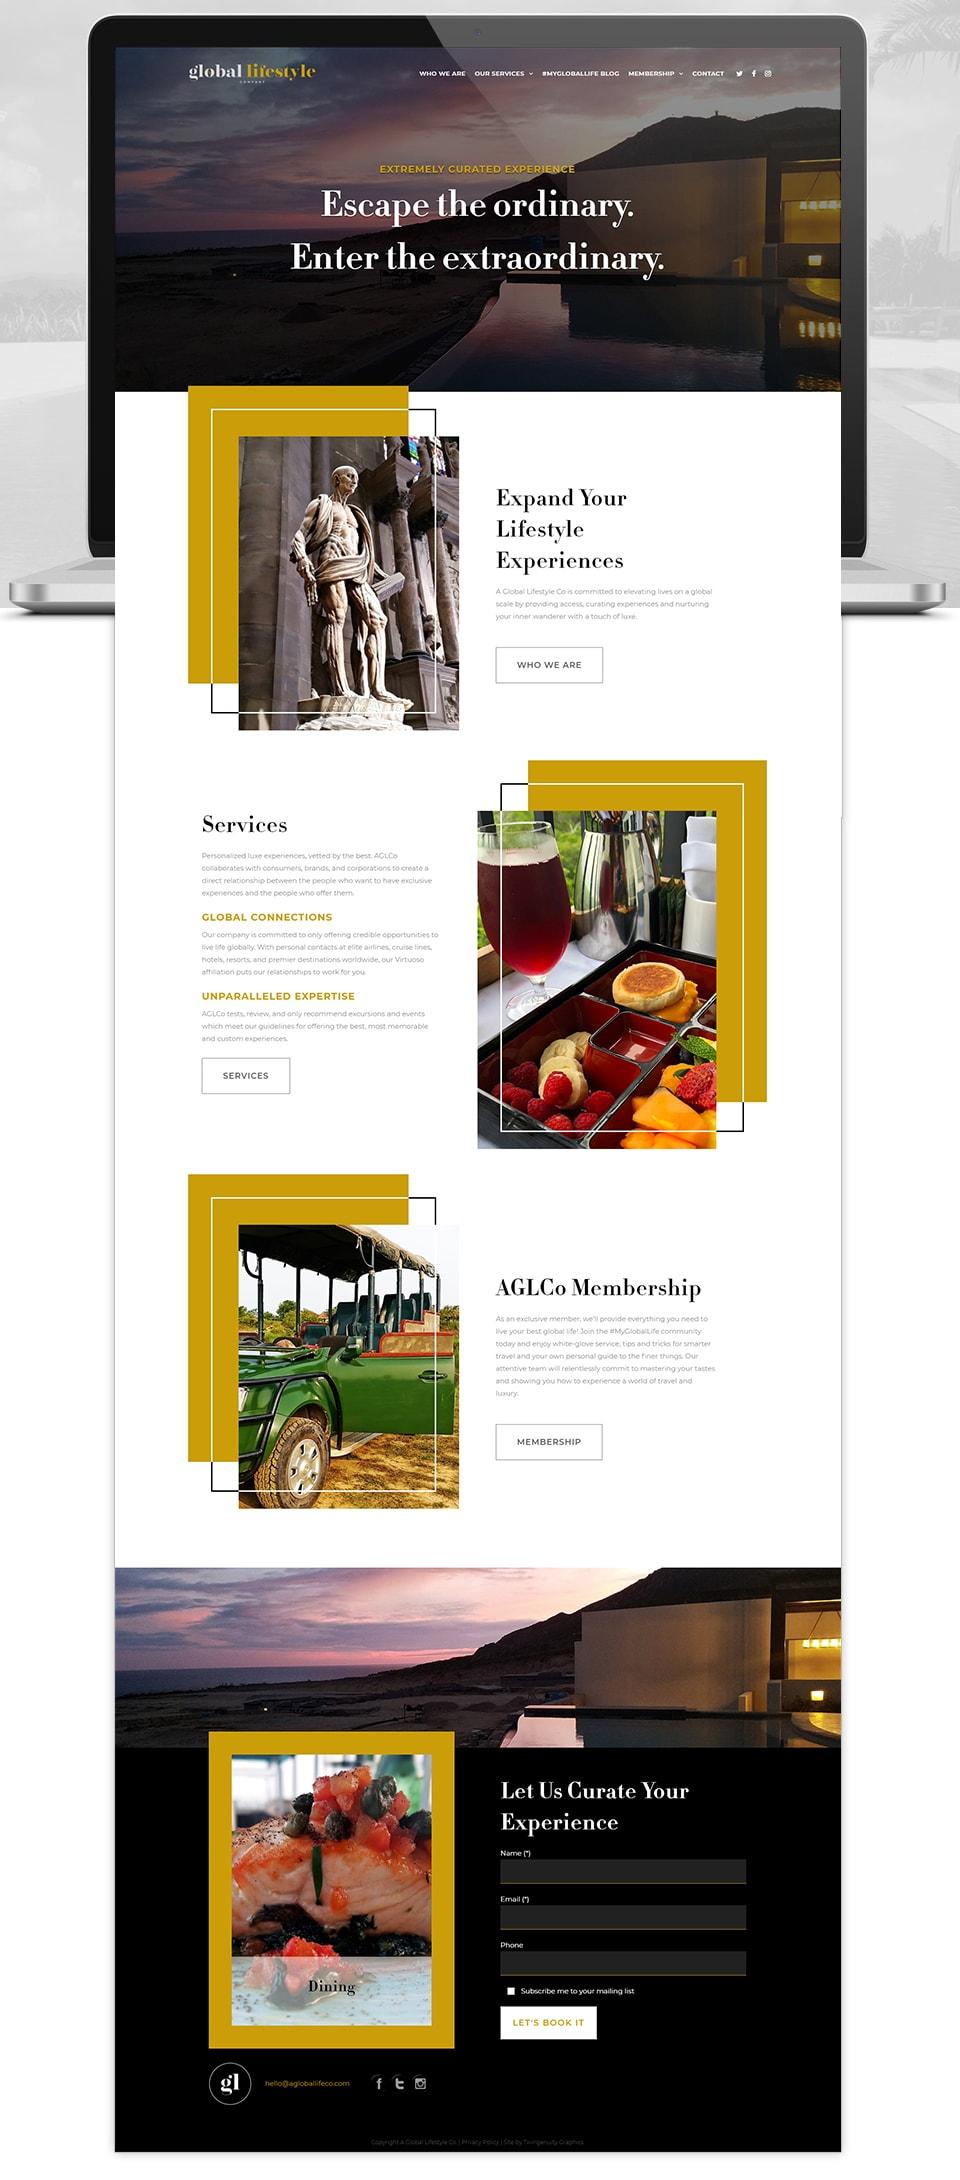 global lifestyle blog wordpress website design